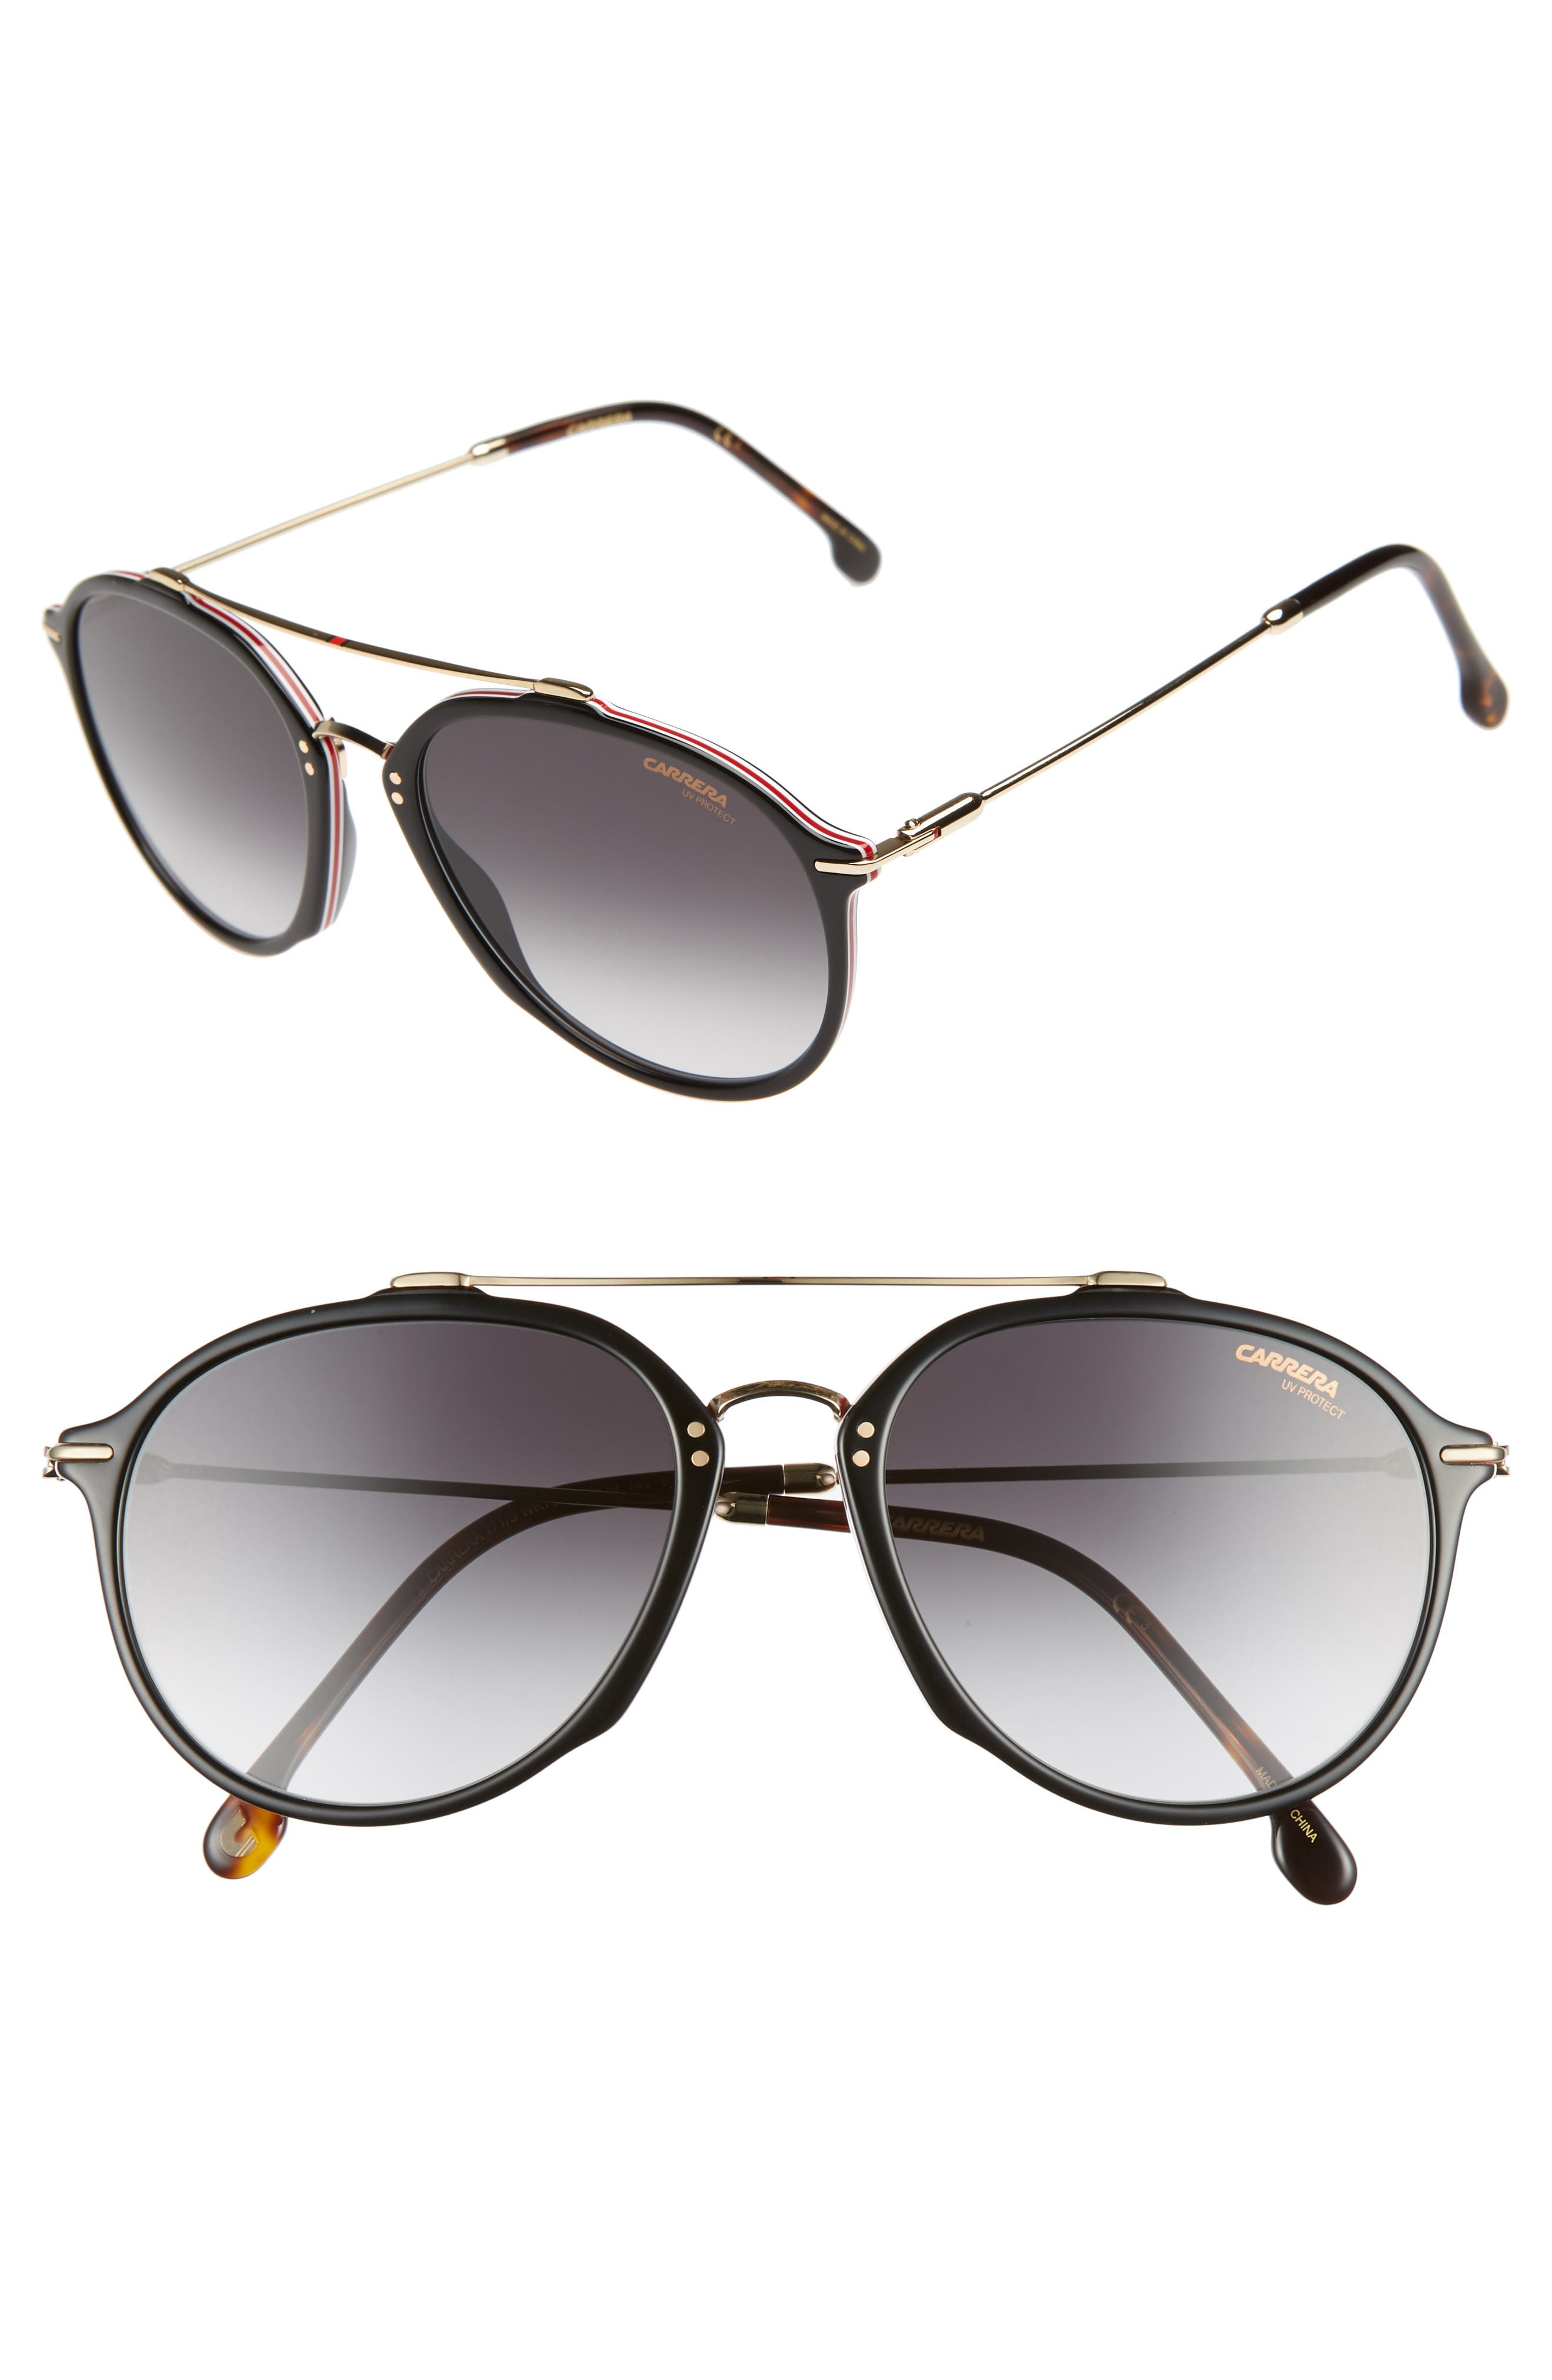 55mm Round Sunglasses,                         Main,                         color, BLACK HAVANA